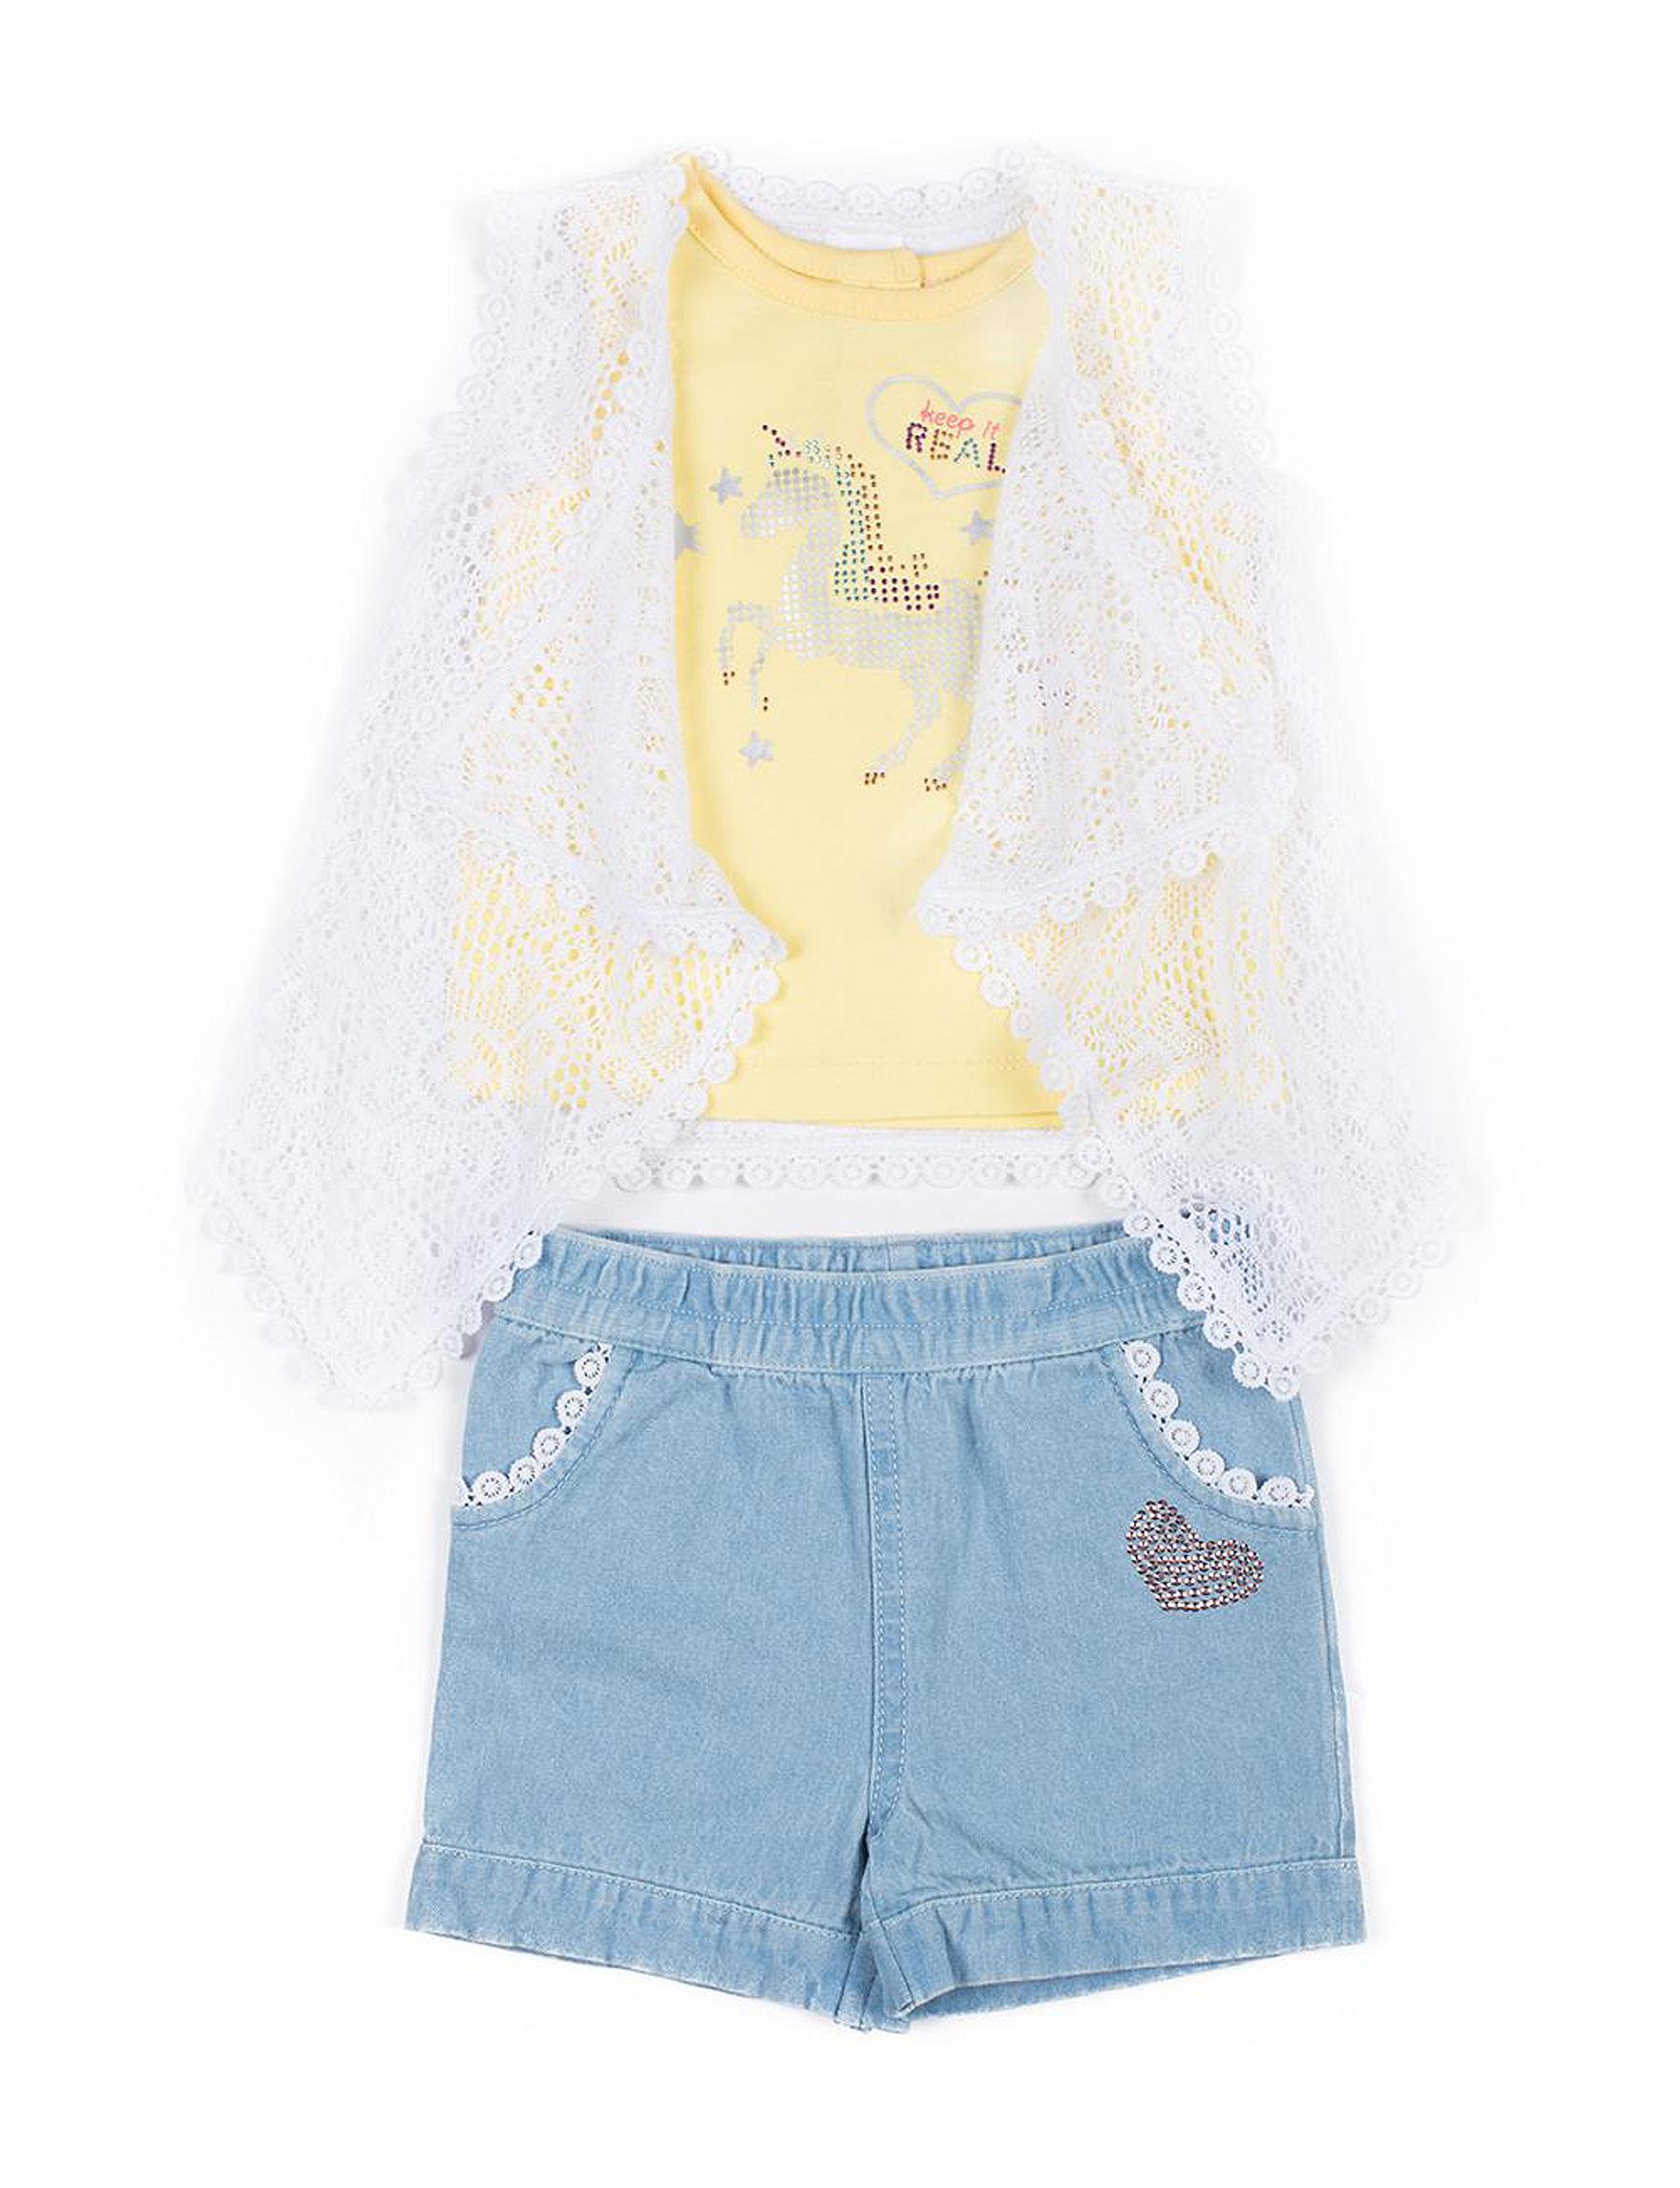 Little Lass Yellow / White